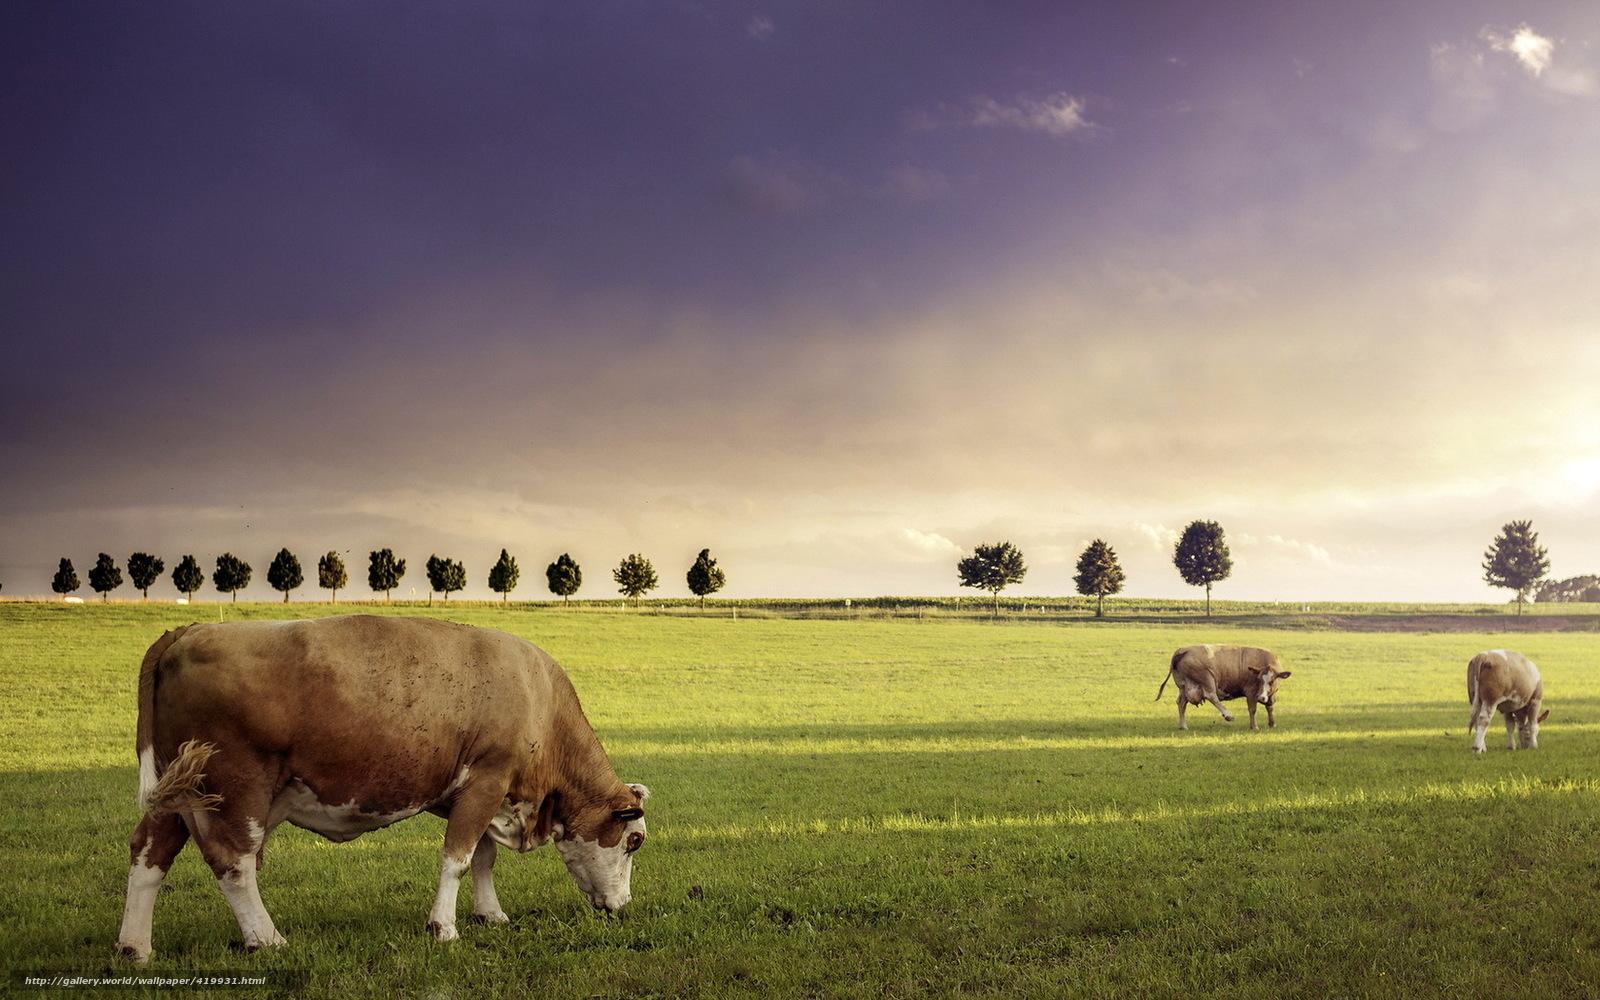 Download Wallpaper Cows Livestock Field Summer Free Desktop Wallpaper In The Resolution 1680x1050 Picture 419931